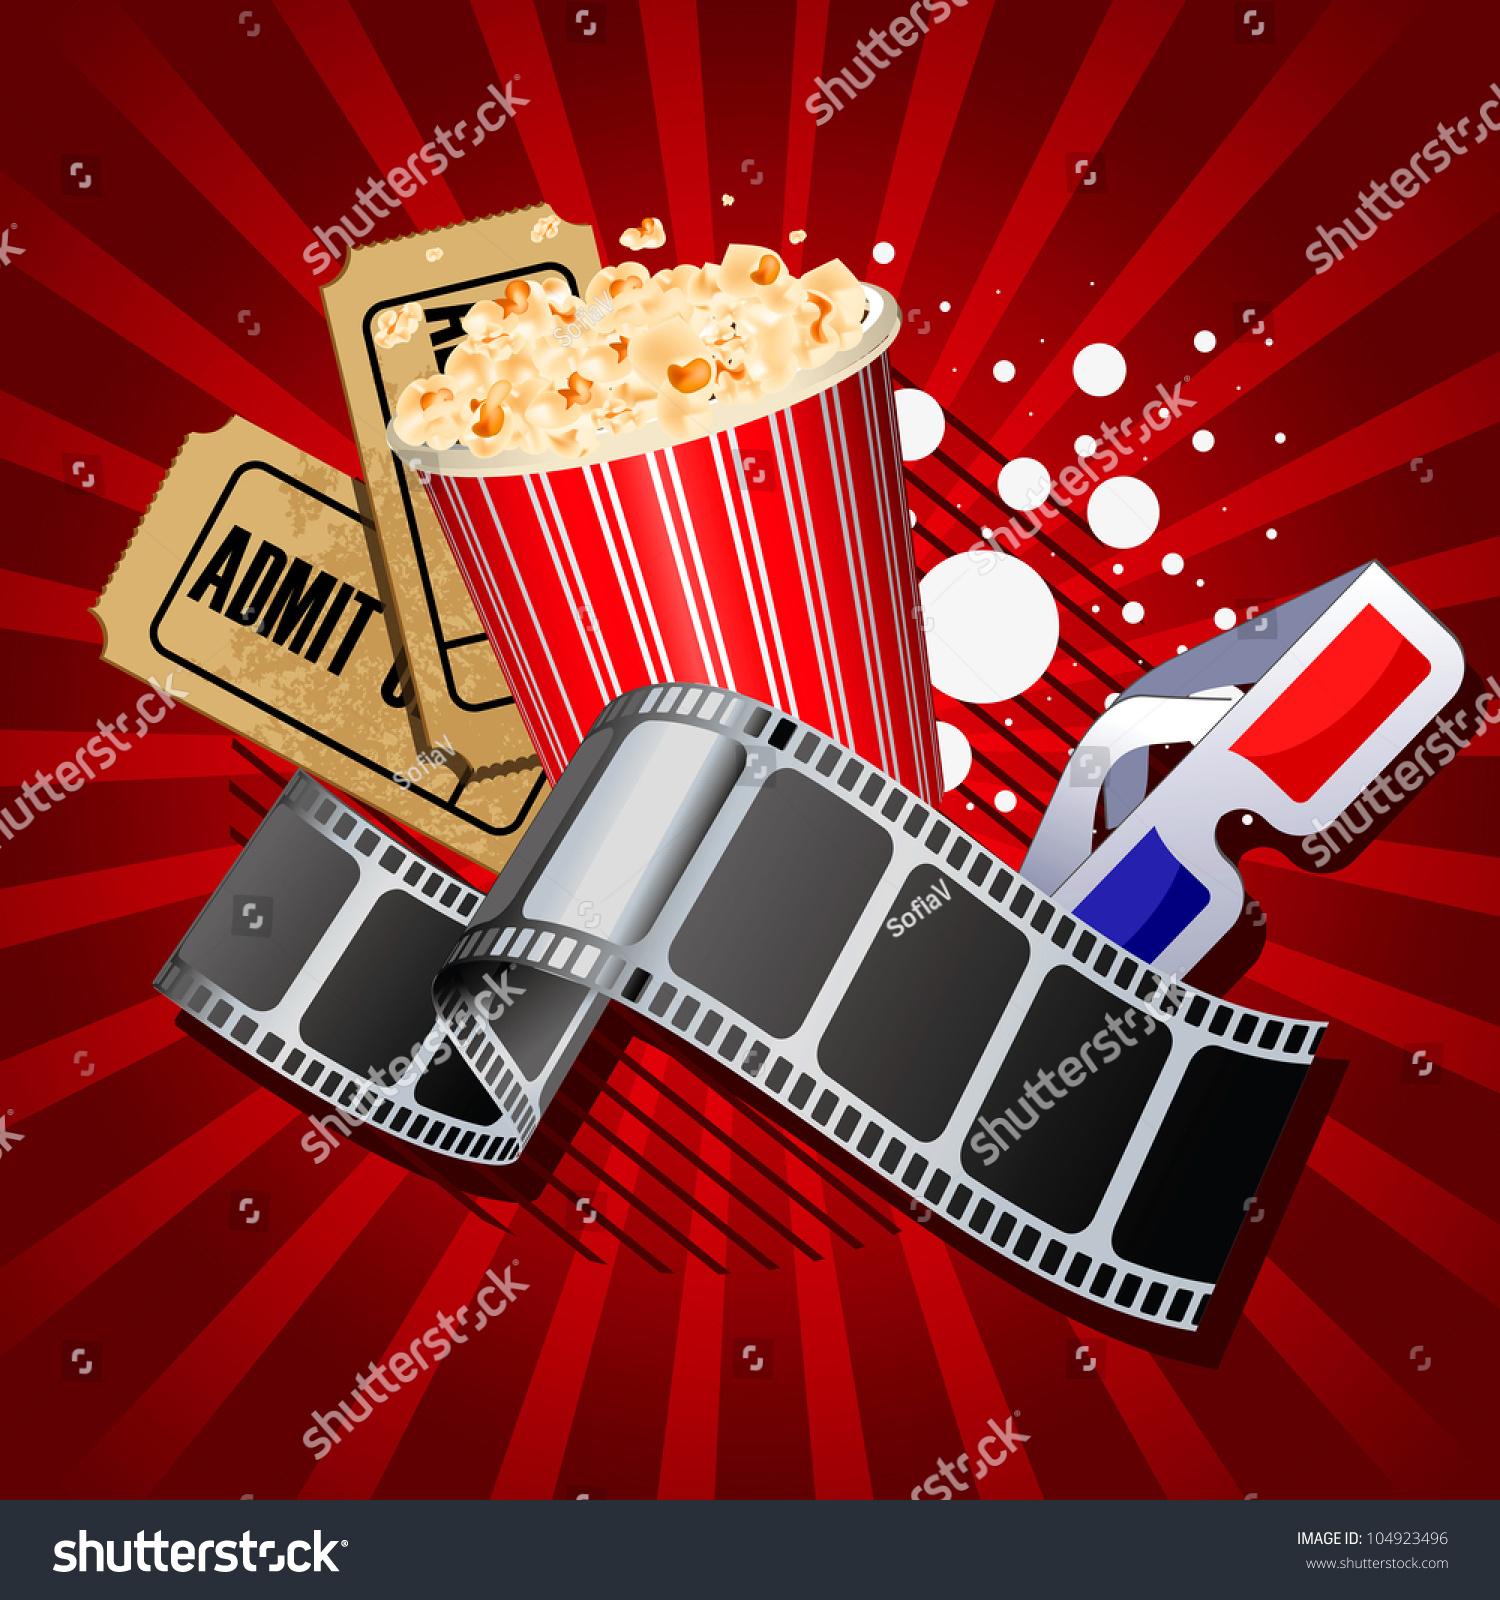 illustration movie theme objects on red stock illustration